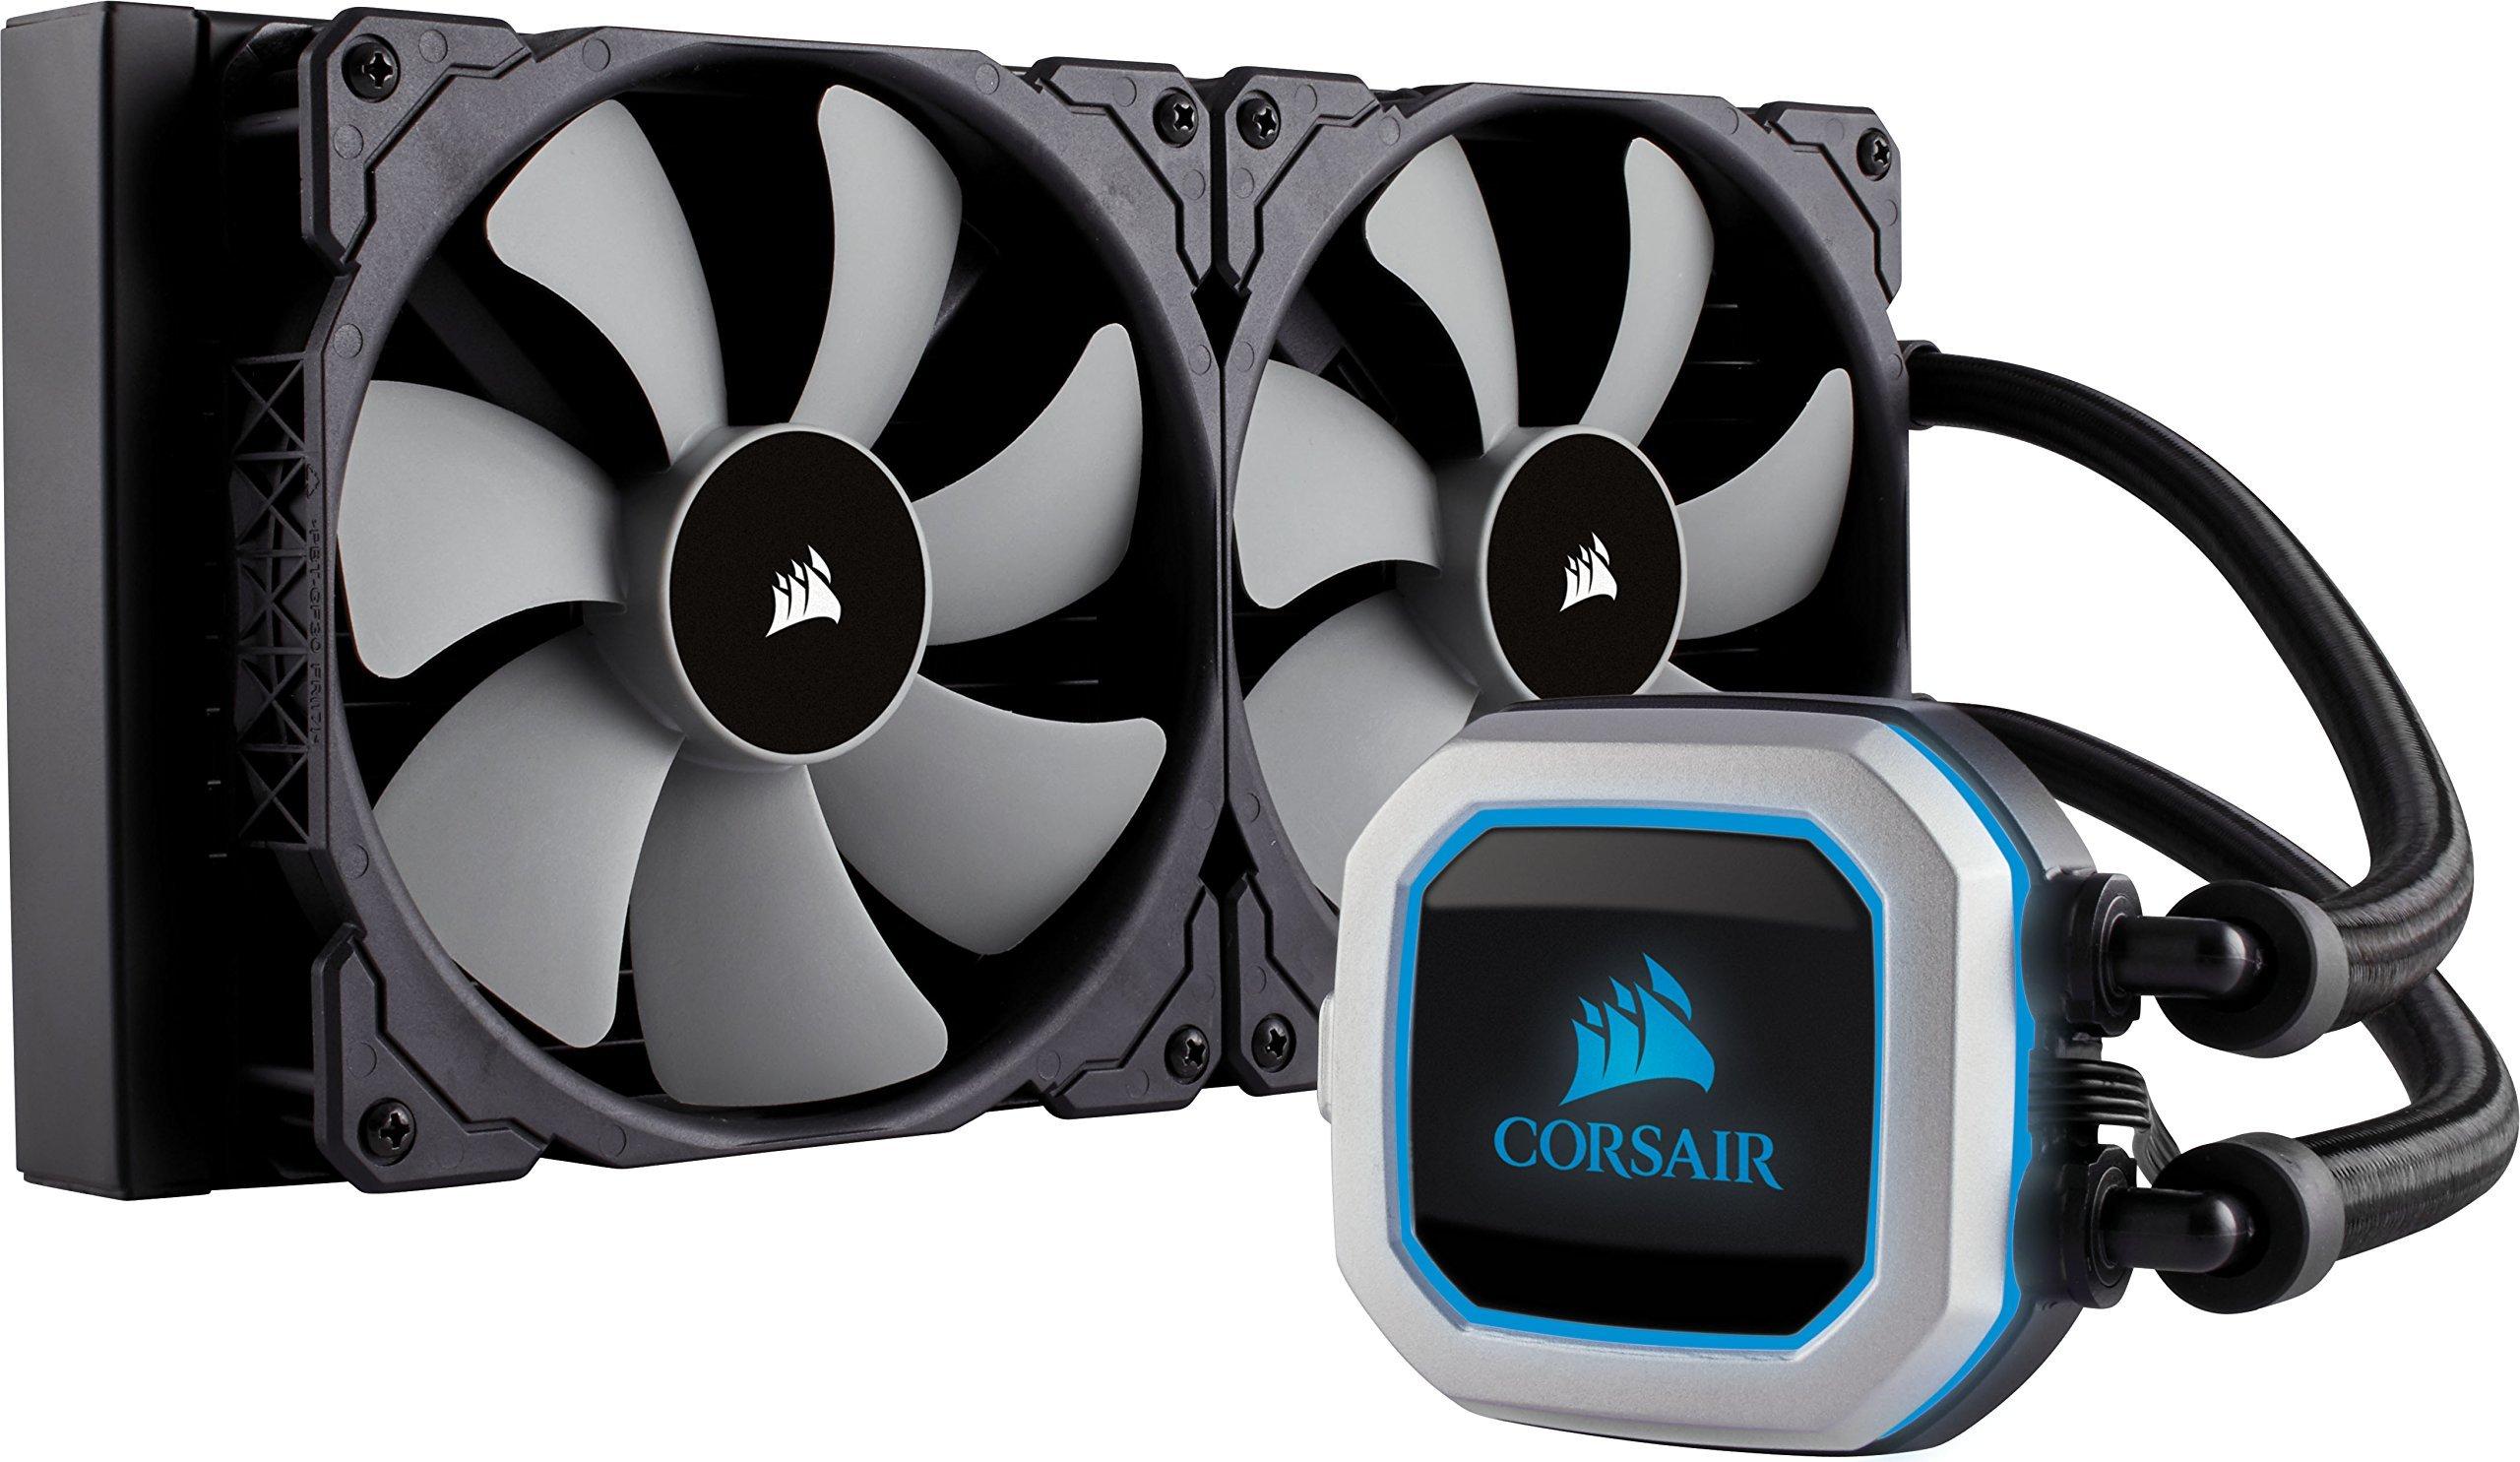 Corsair Hydro Series H115i PRO RGB 280mm Radiator Dual 140mm ML Series PWM Fans Advanced RGB Lighting Liquid CPU Cooler (CW-9060032-WW) by Corsair